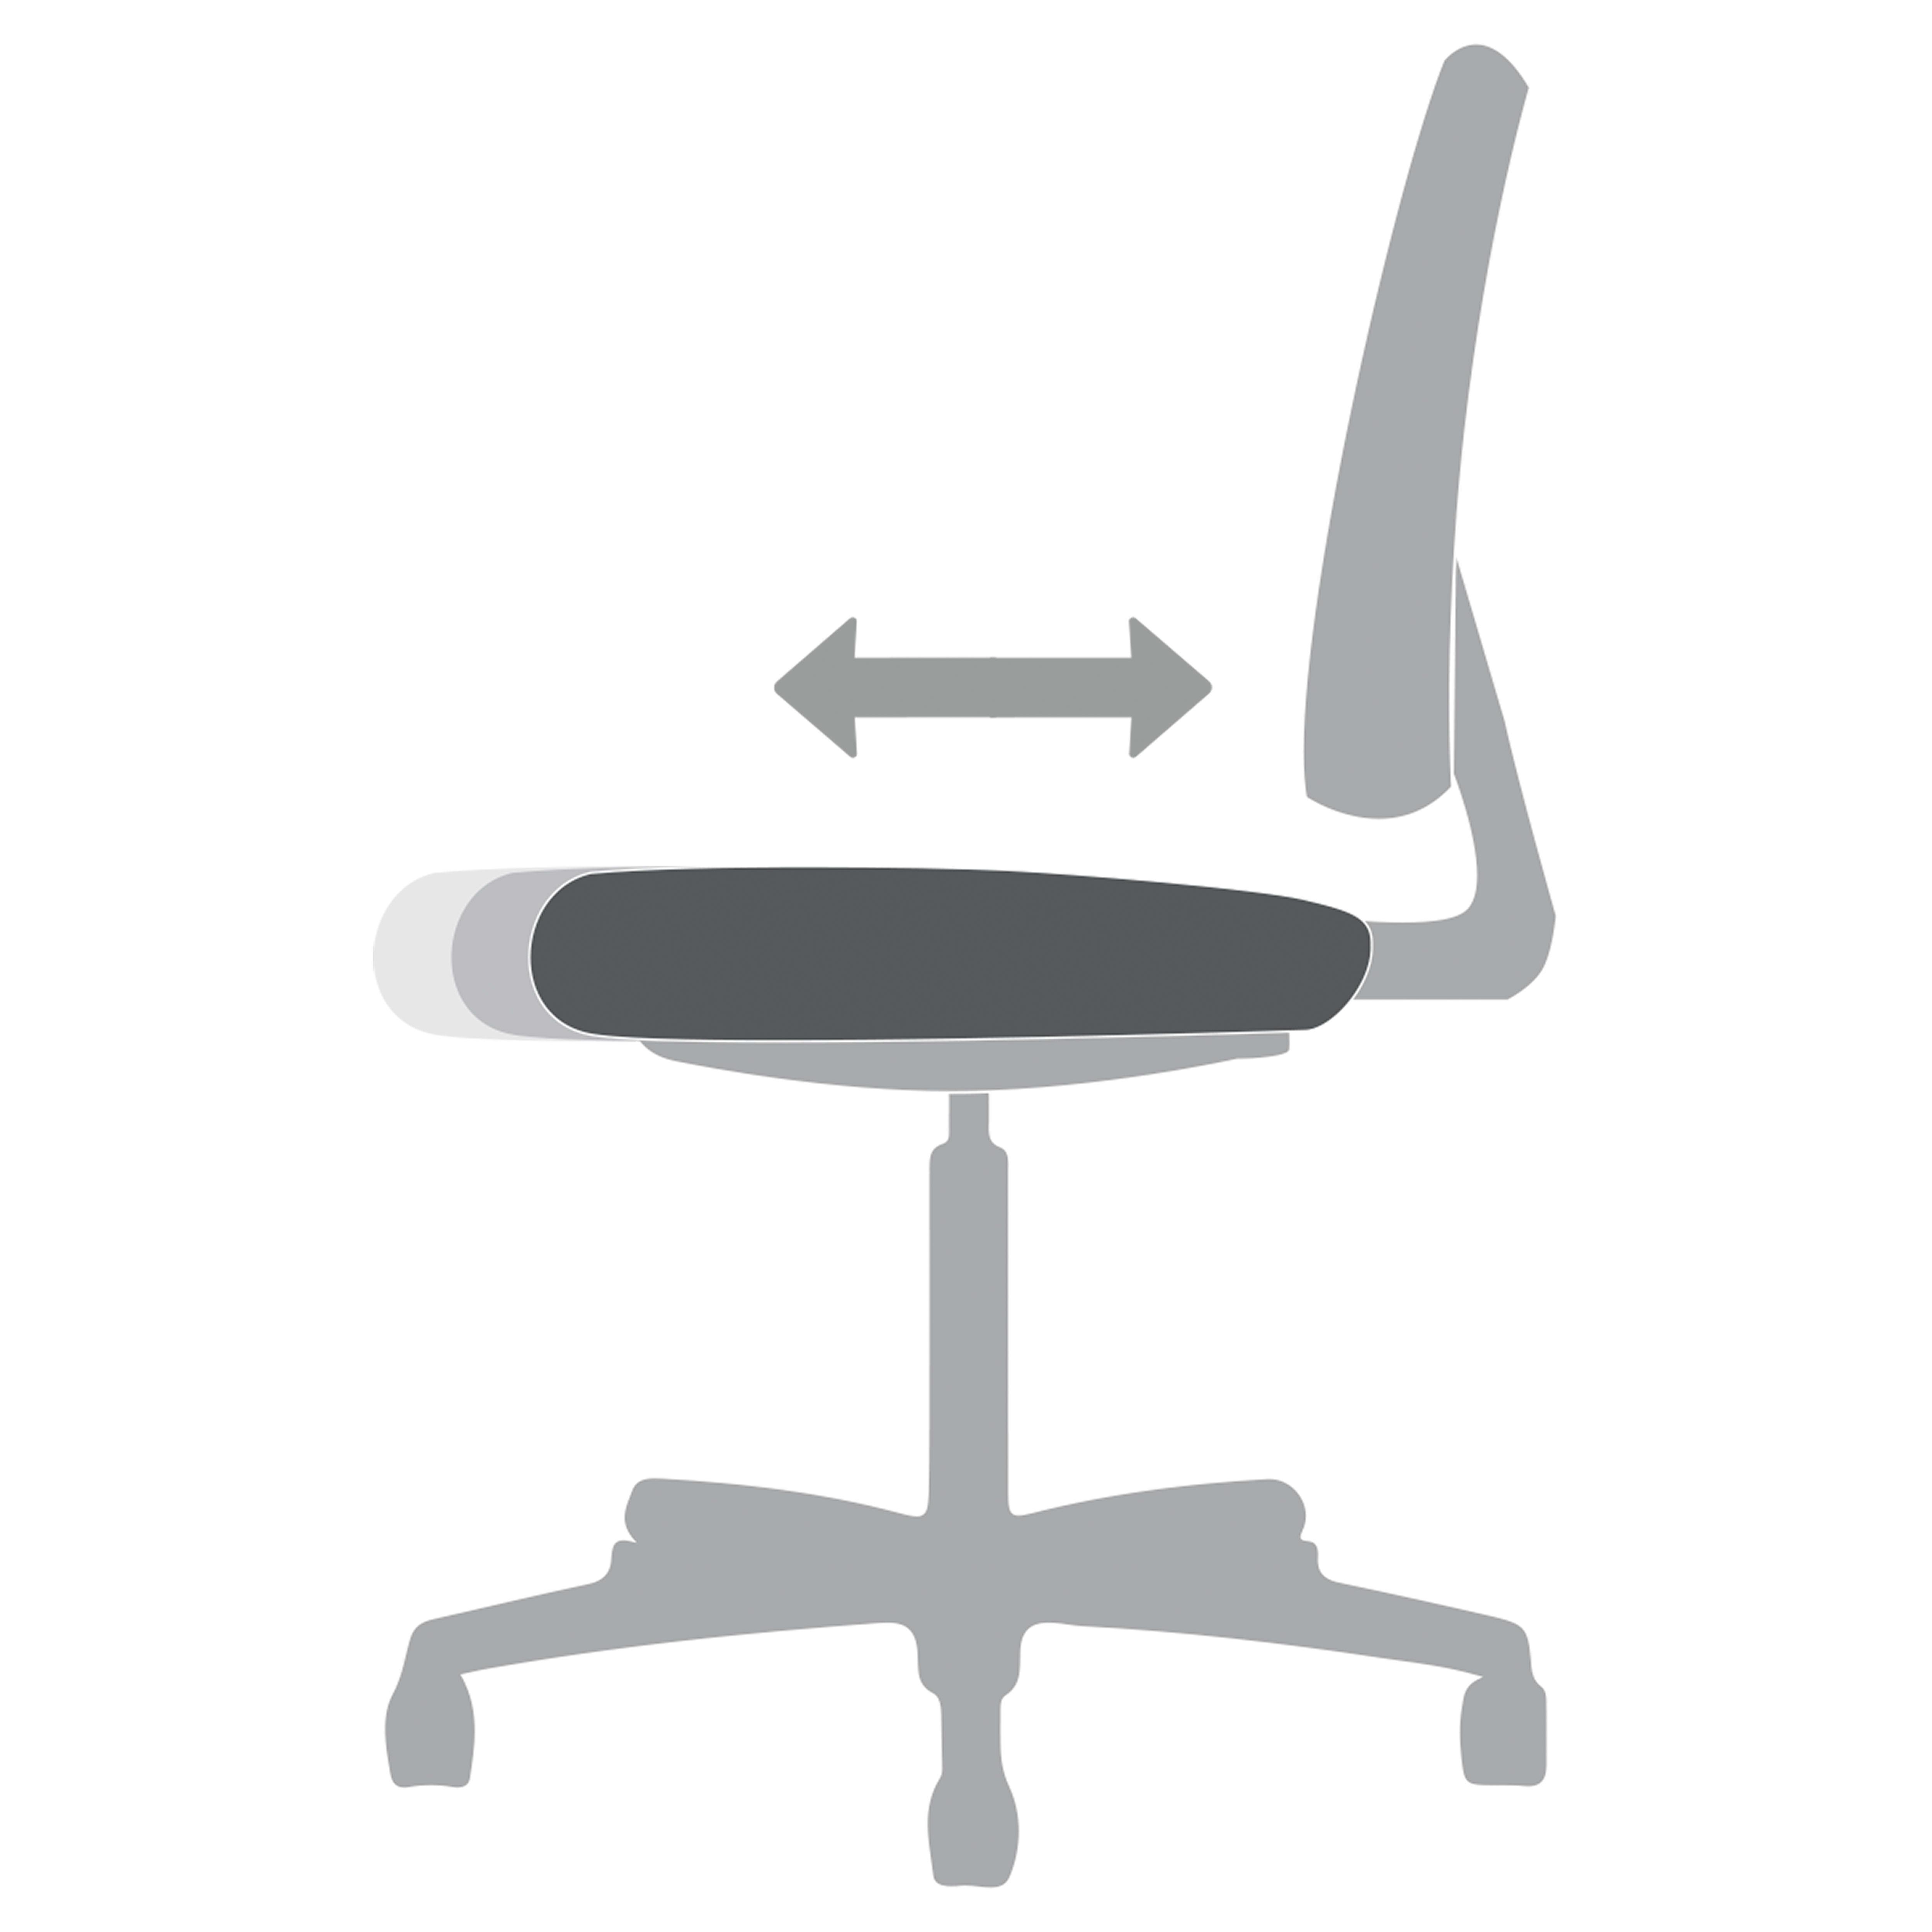 D-Seat-Glide-Mechanism